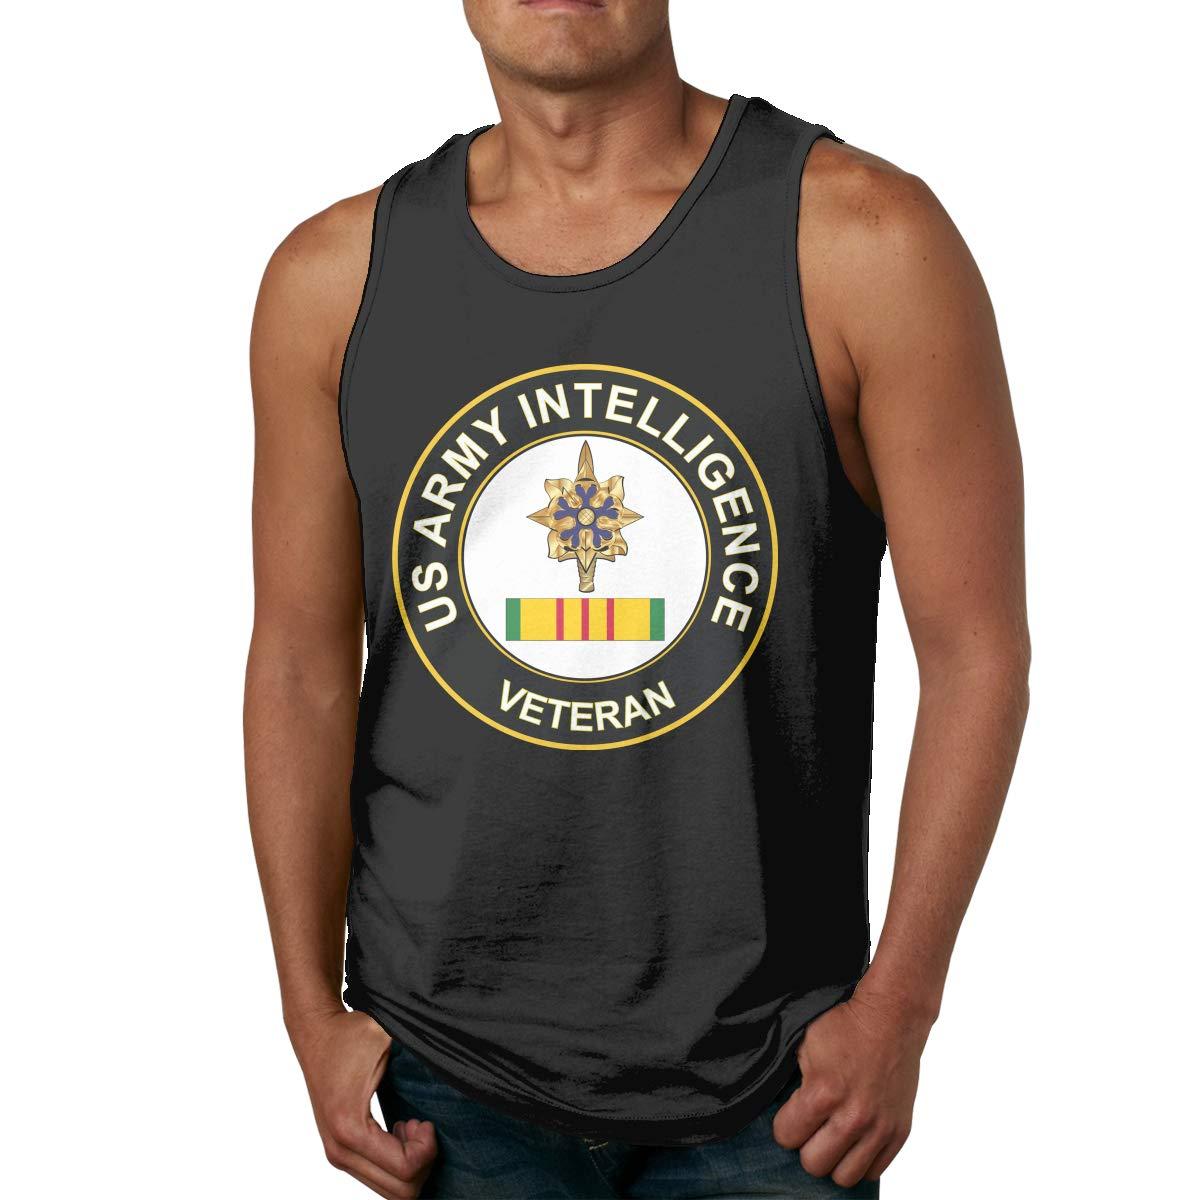 BGFYJN Army Intelligence Vietnam Veteran Mens Cotton Undershirts Crew Neck Tank Tops